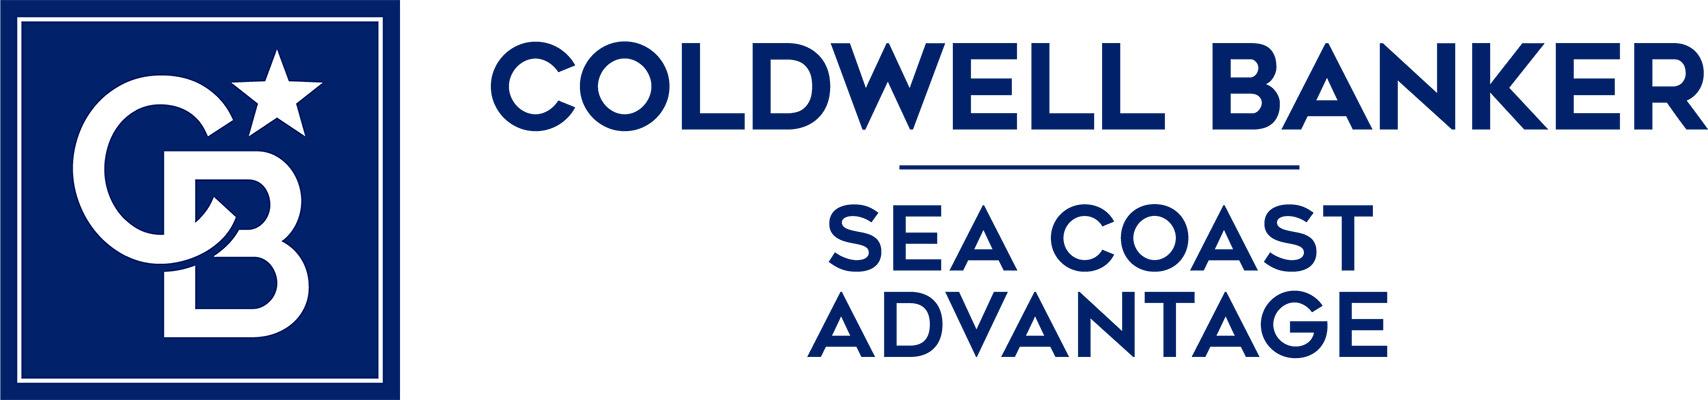 Brandon Pichey - Coldwell Banker Chicora Advantage Logo